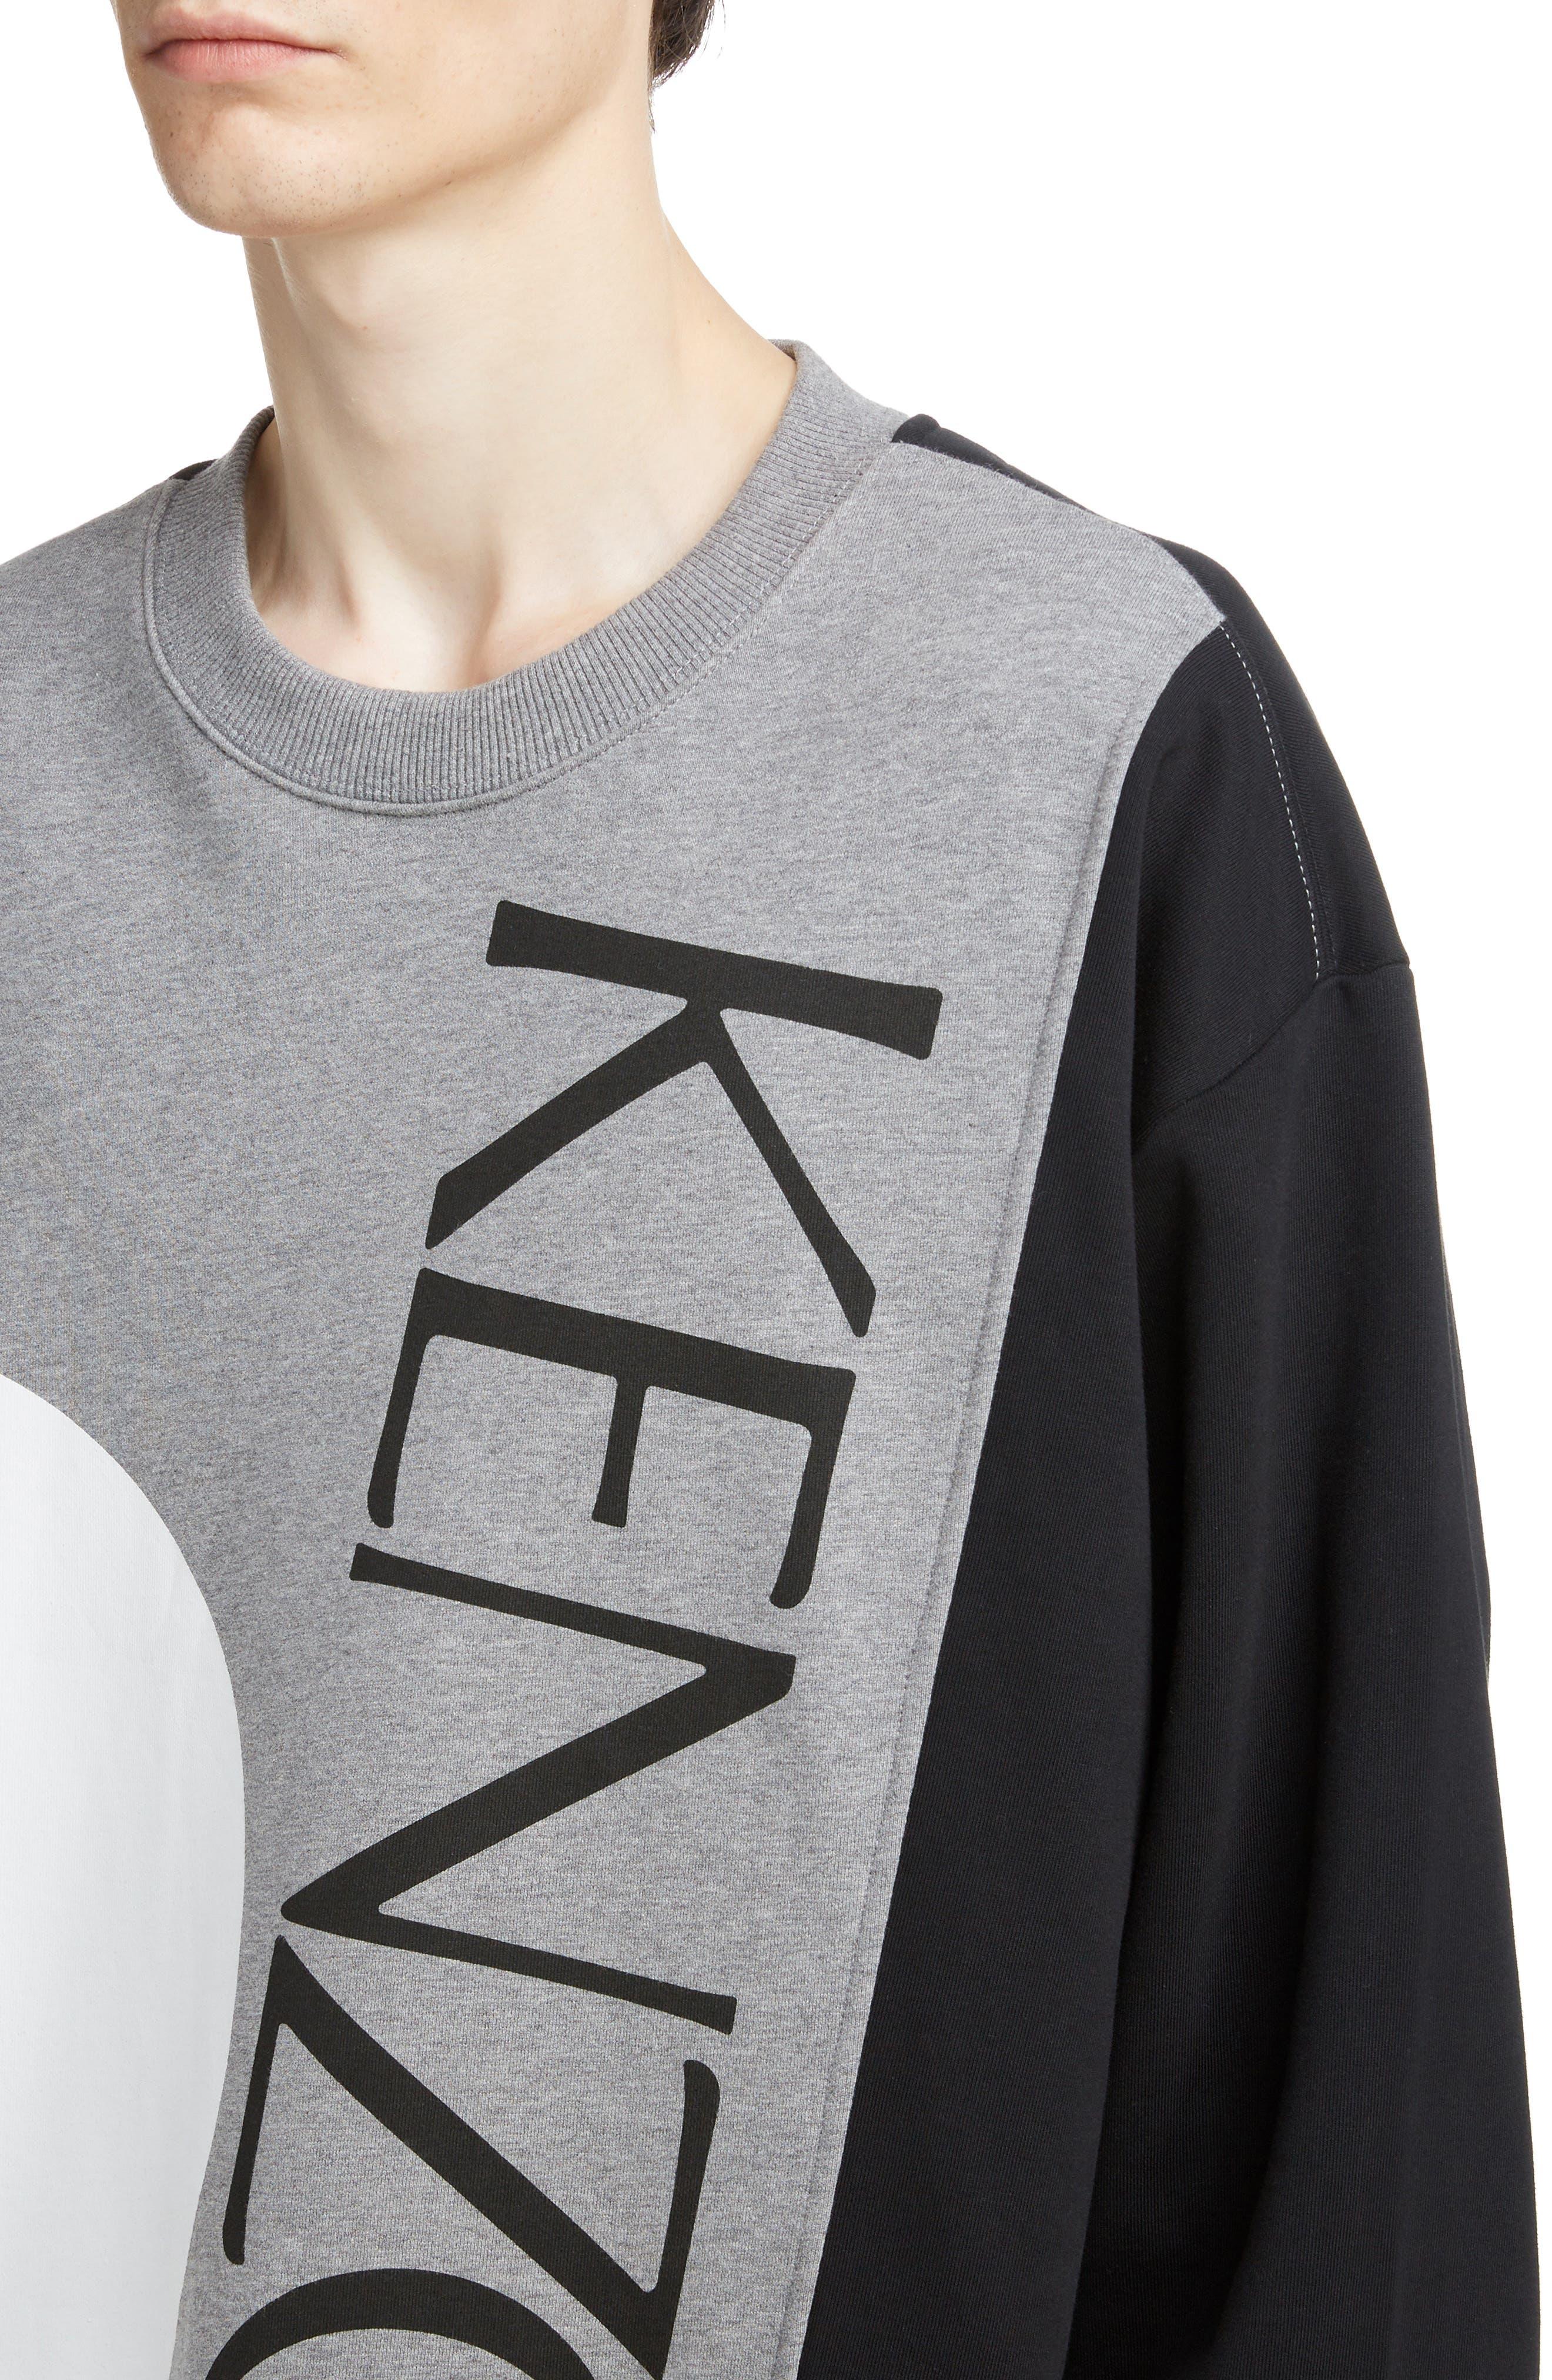 KENZO, Oversize Colorblock Sweatshirt, Alternate thumbnail 4, color, DOVE GREY